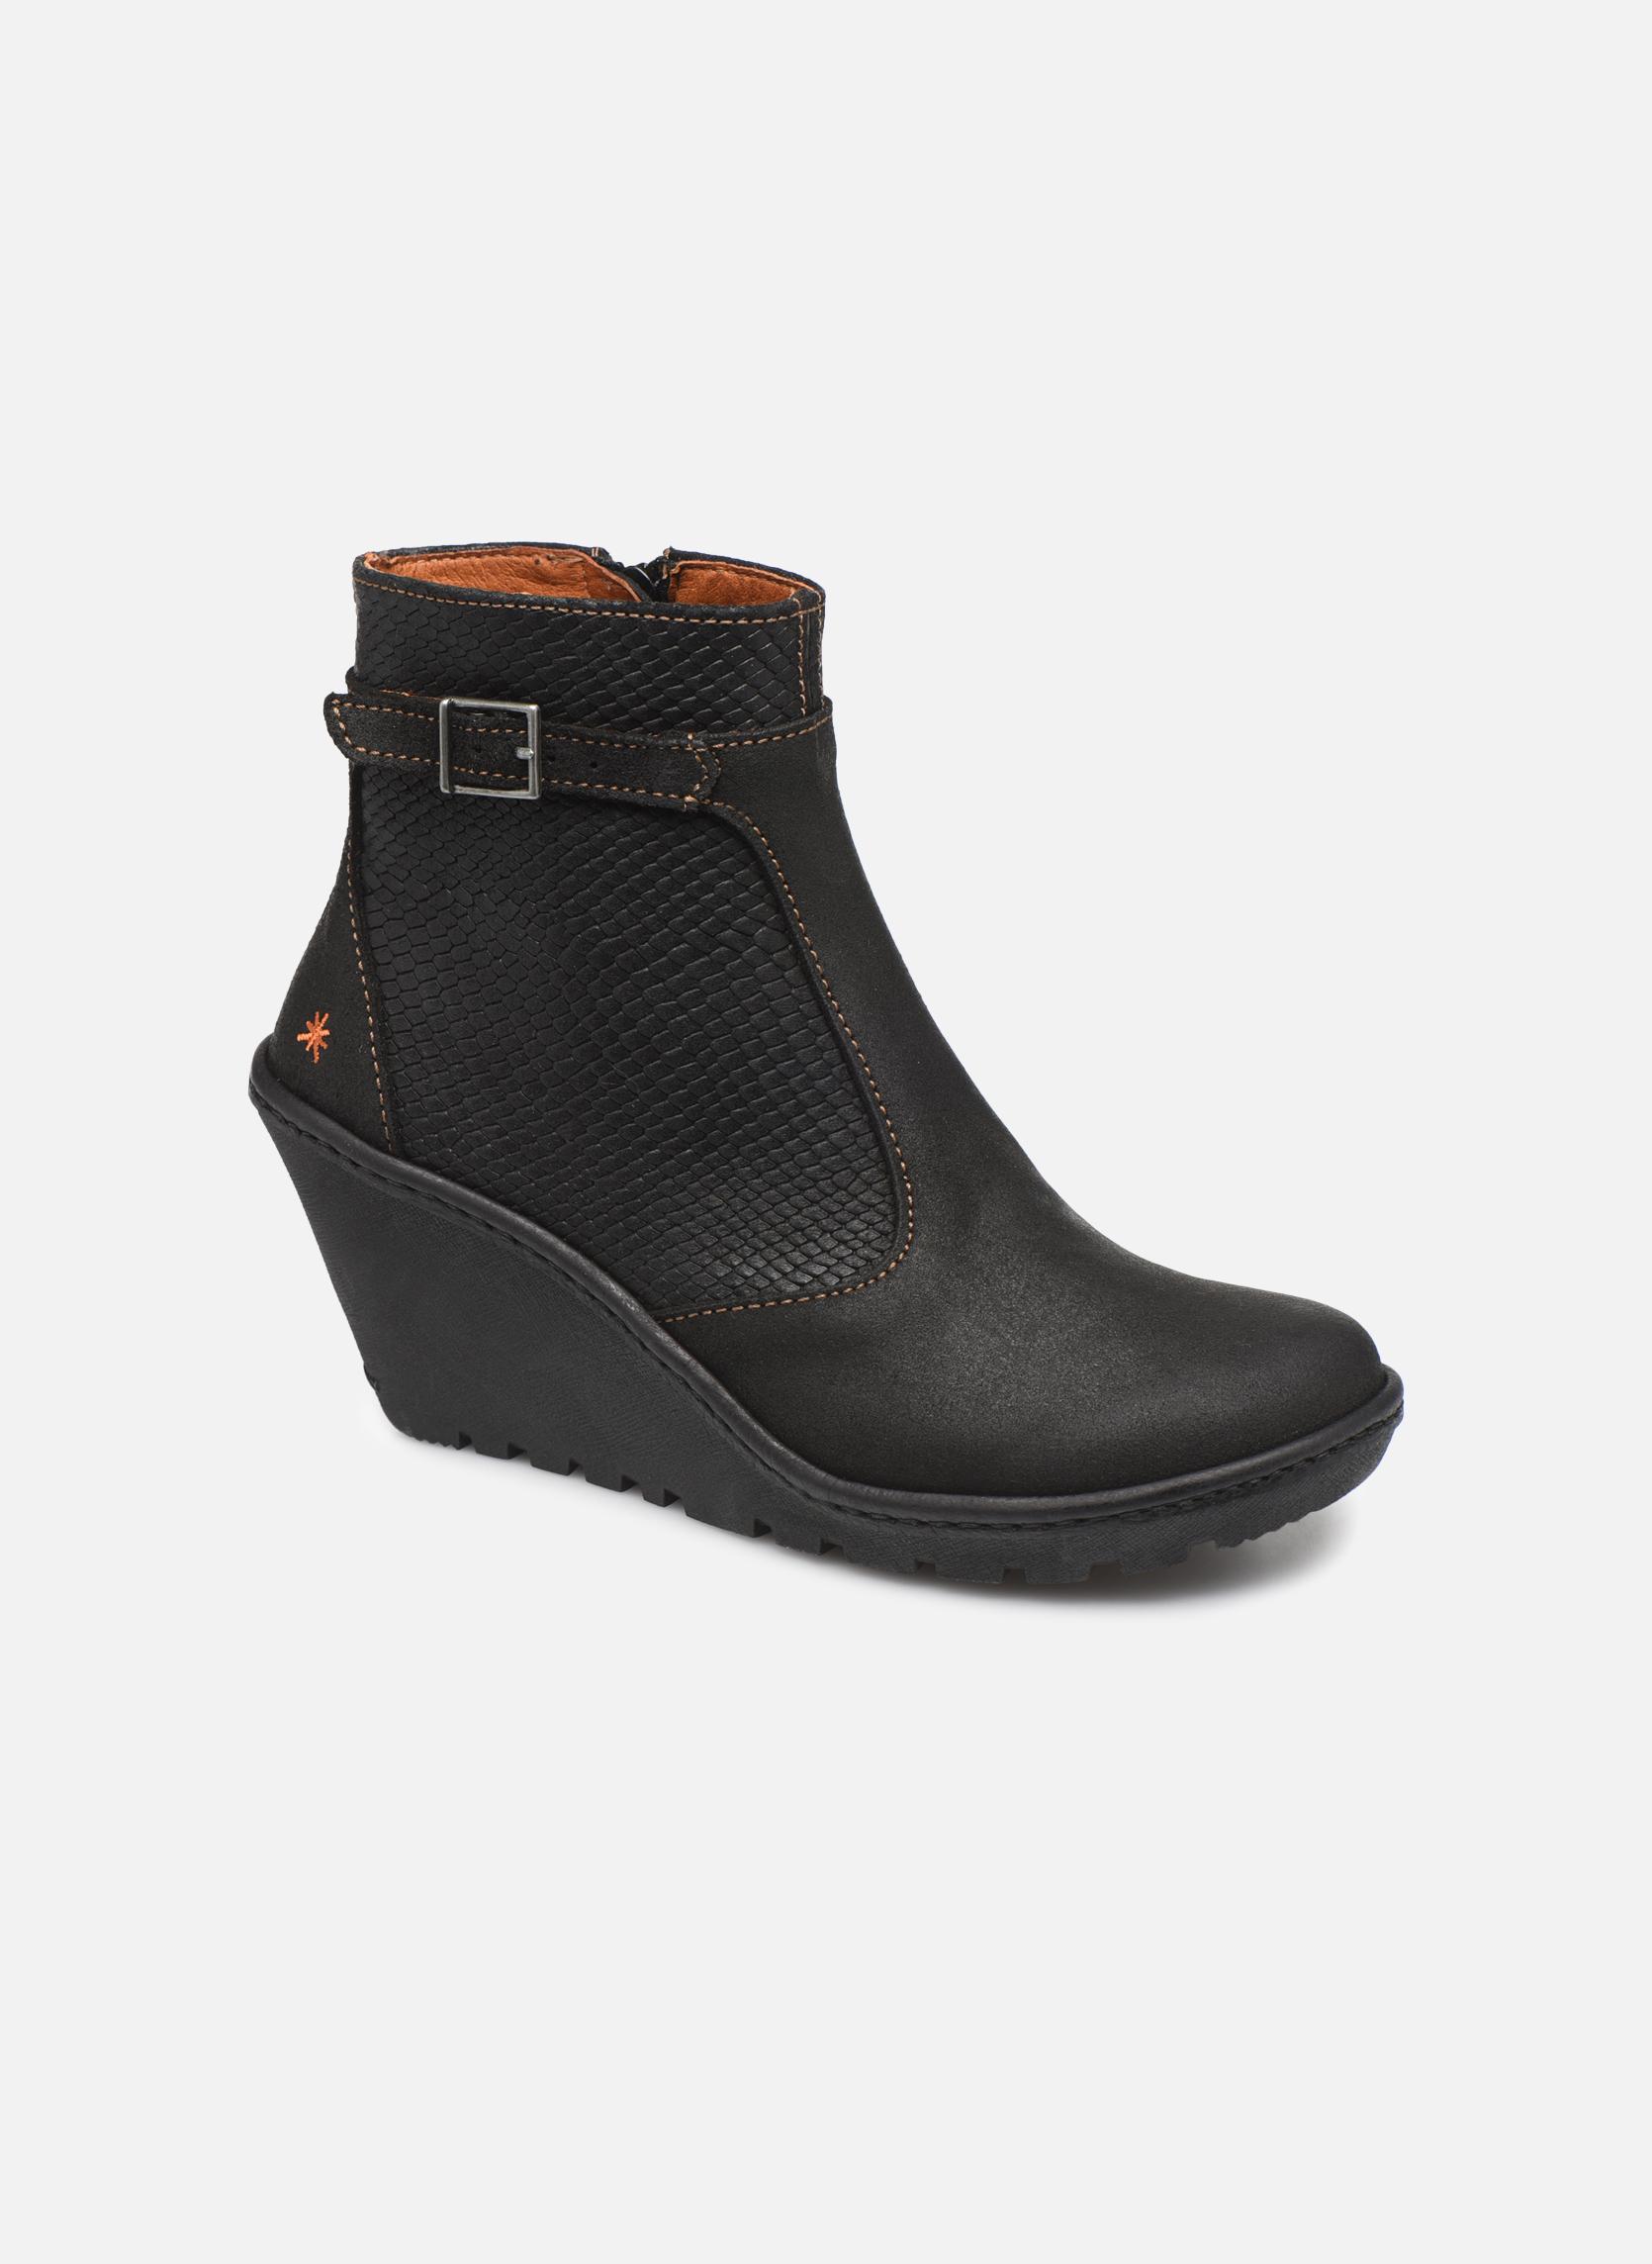 Boots en enkellaarsjes Vitoria 242 by Art